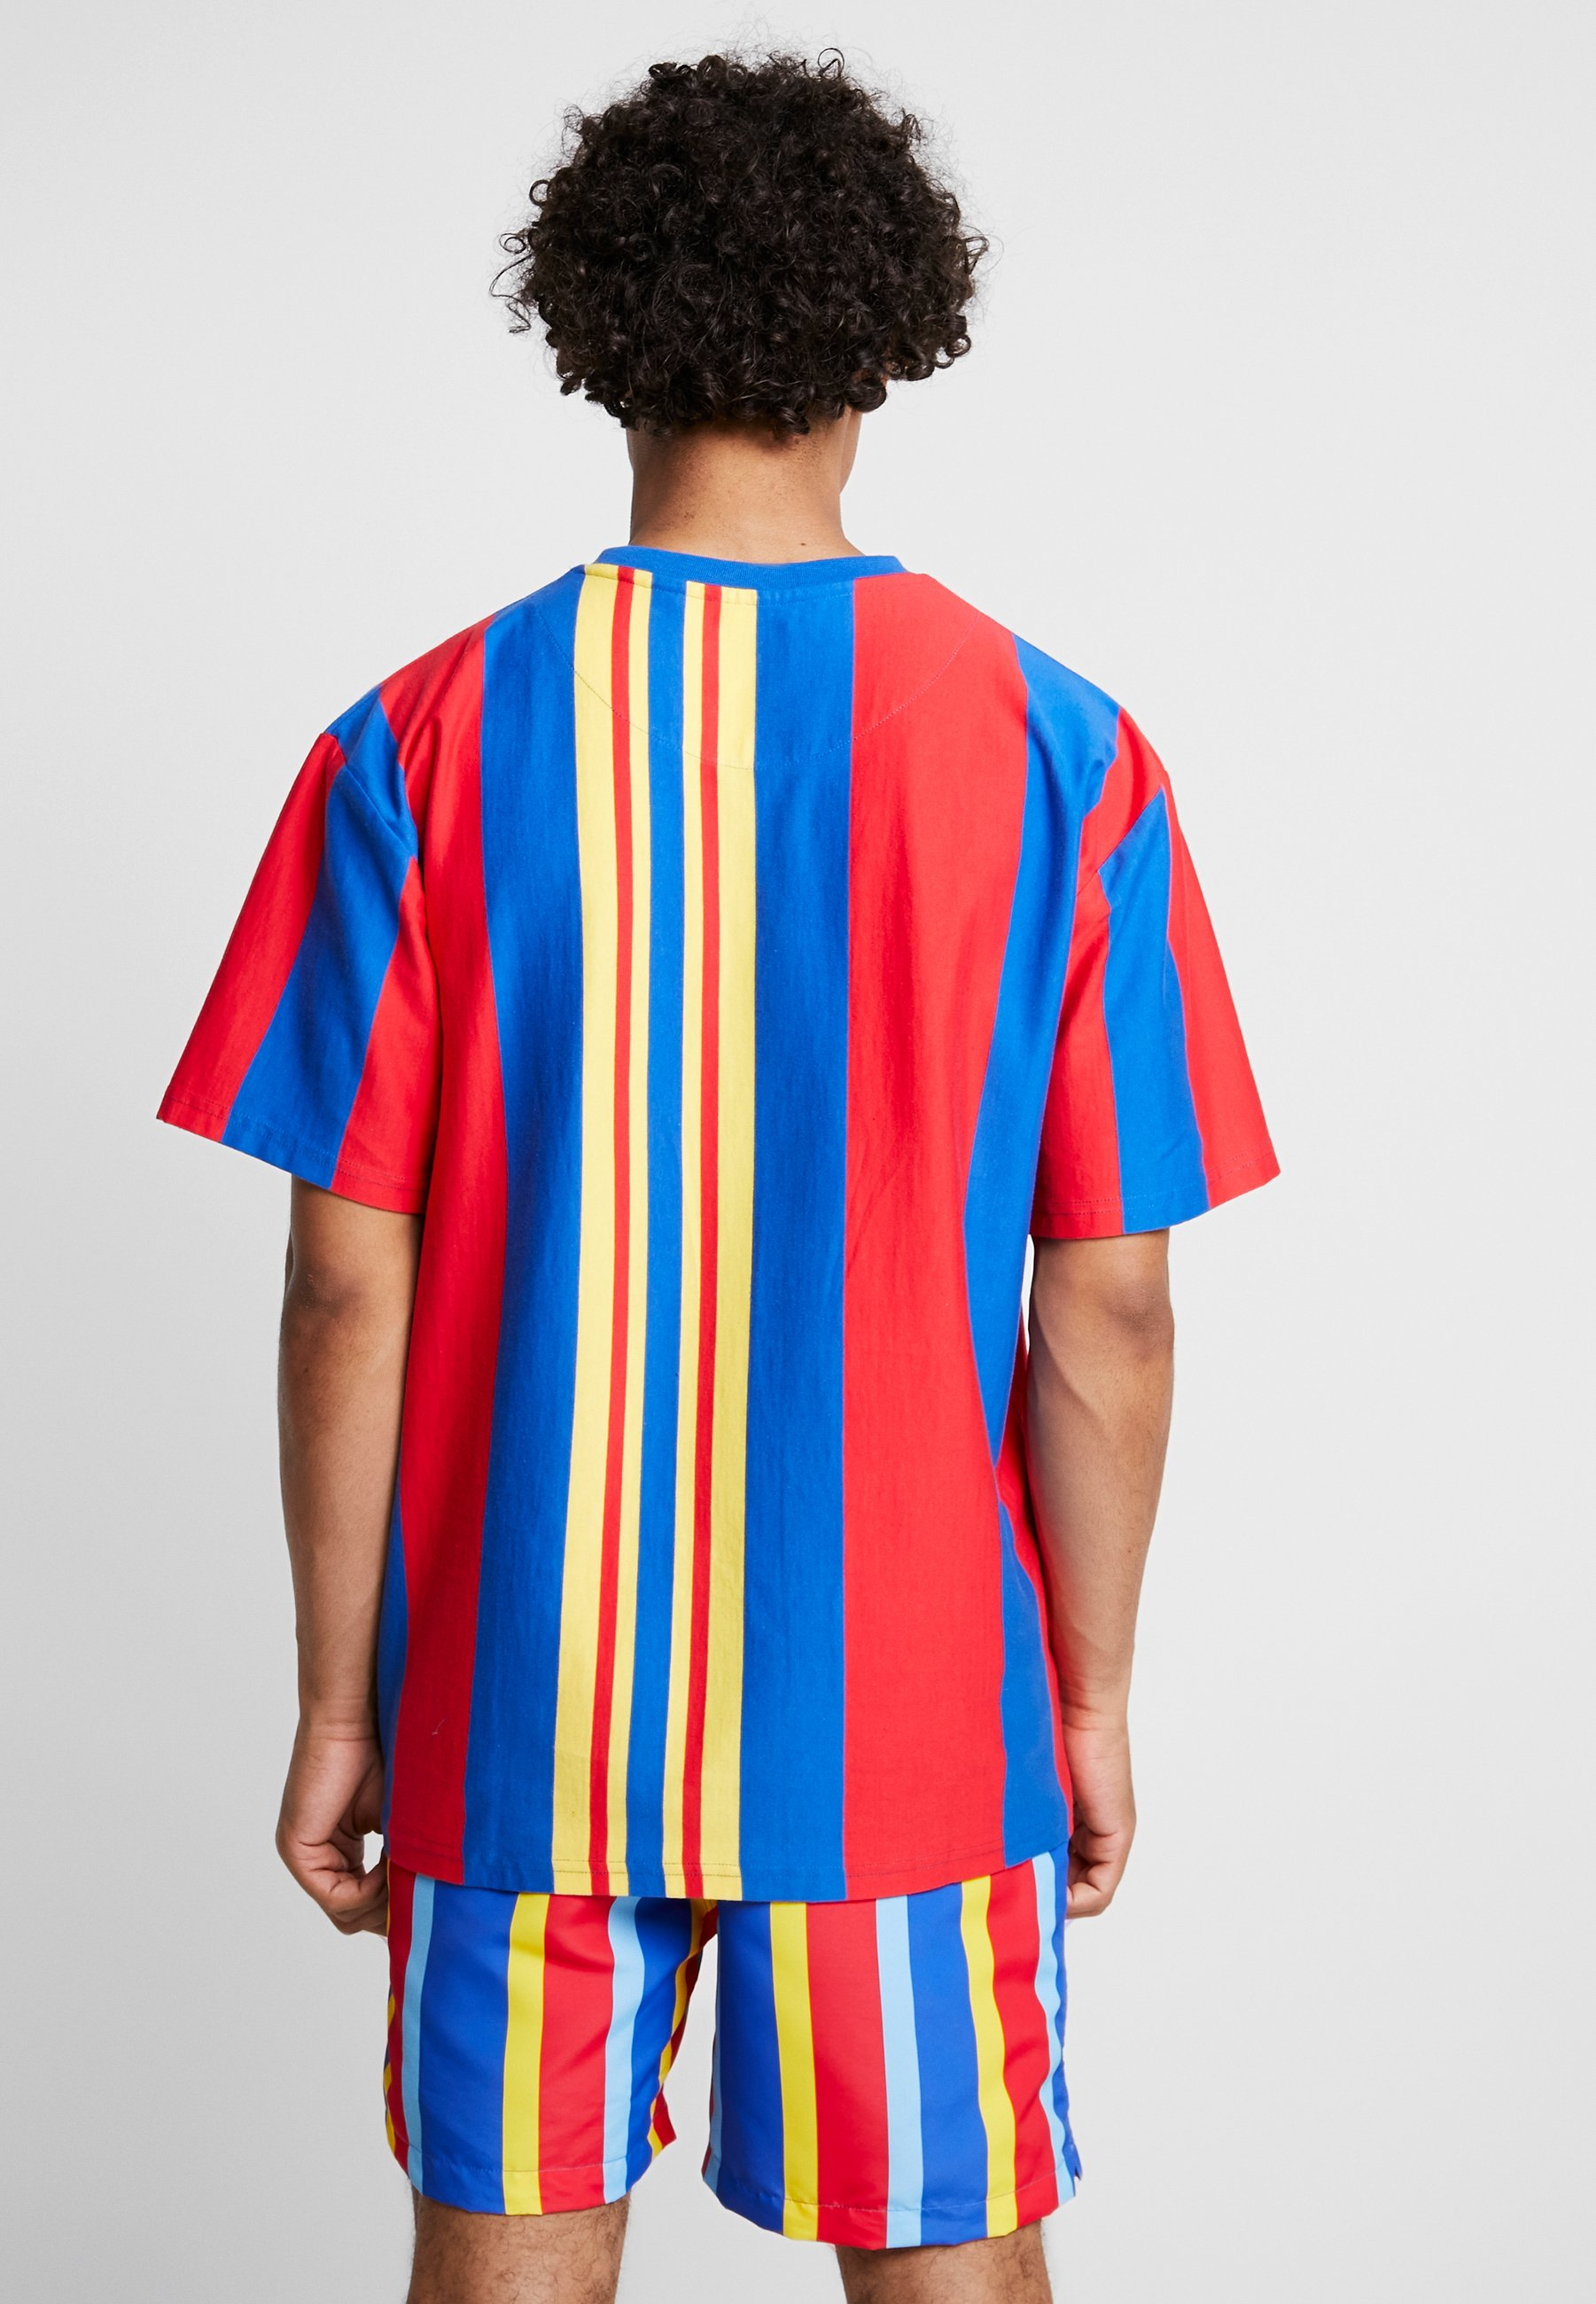 Kani blue shirt Karl TeeT Red Signature Stripe Imprimé yellow kTwXPZiulO